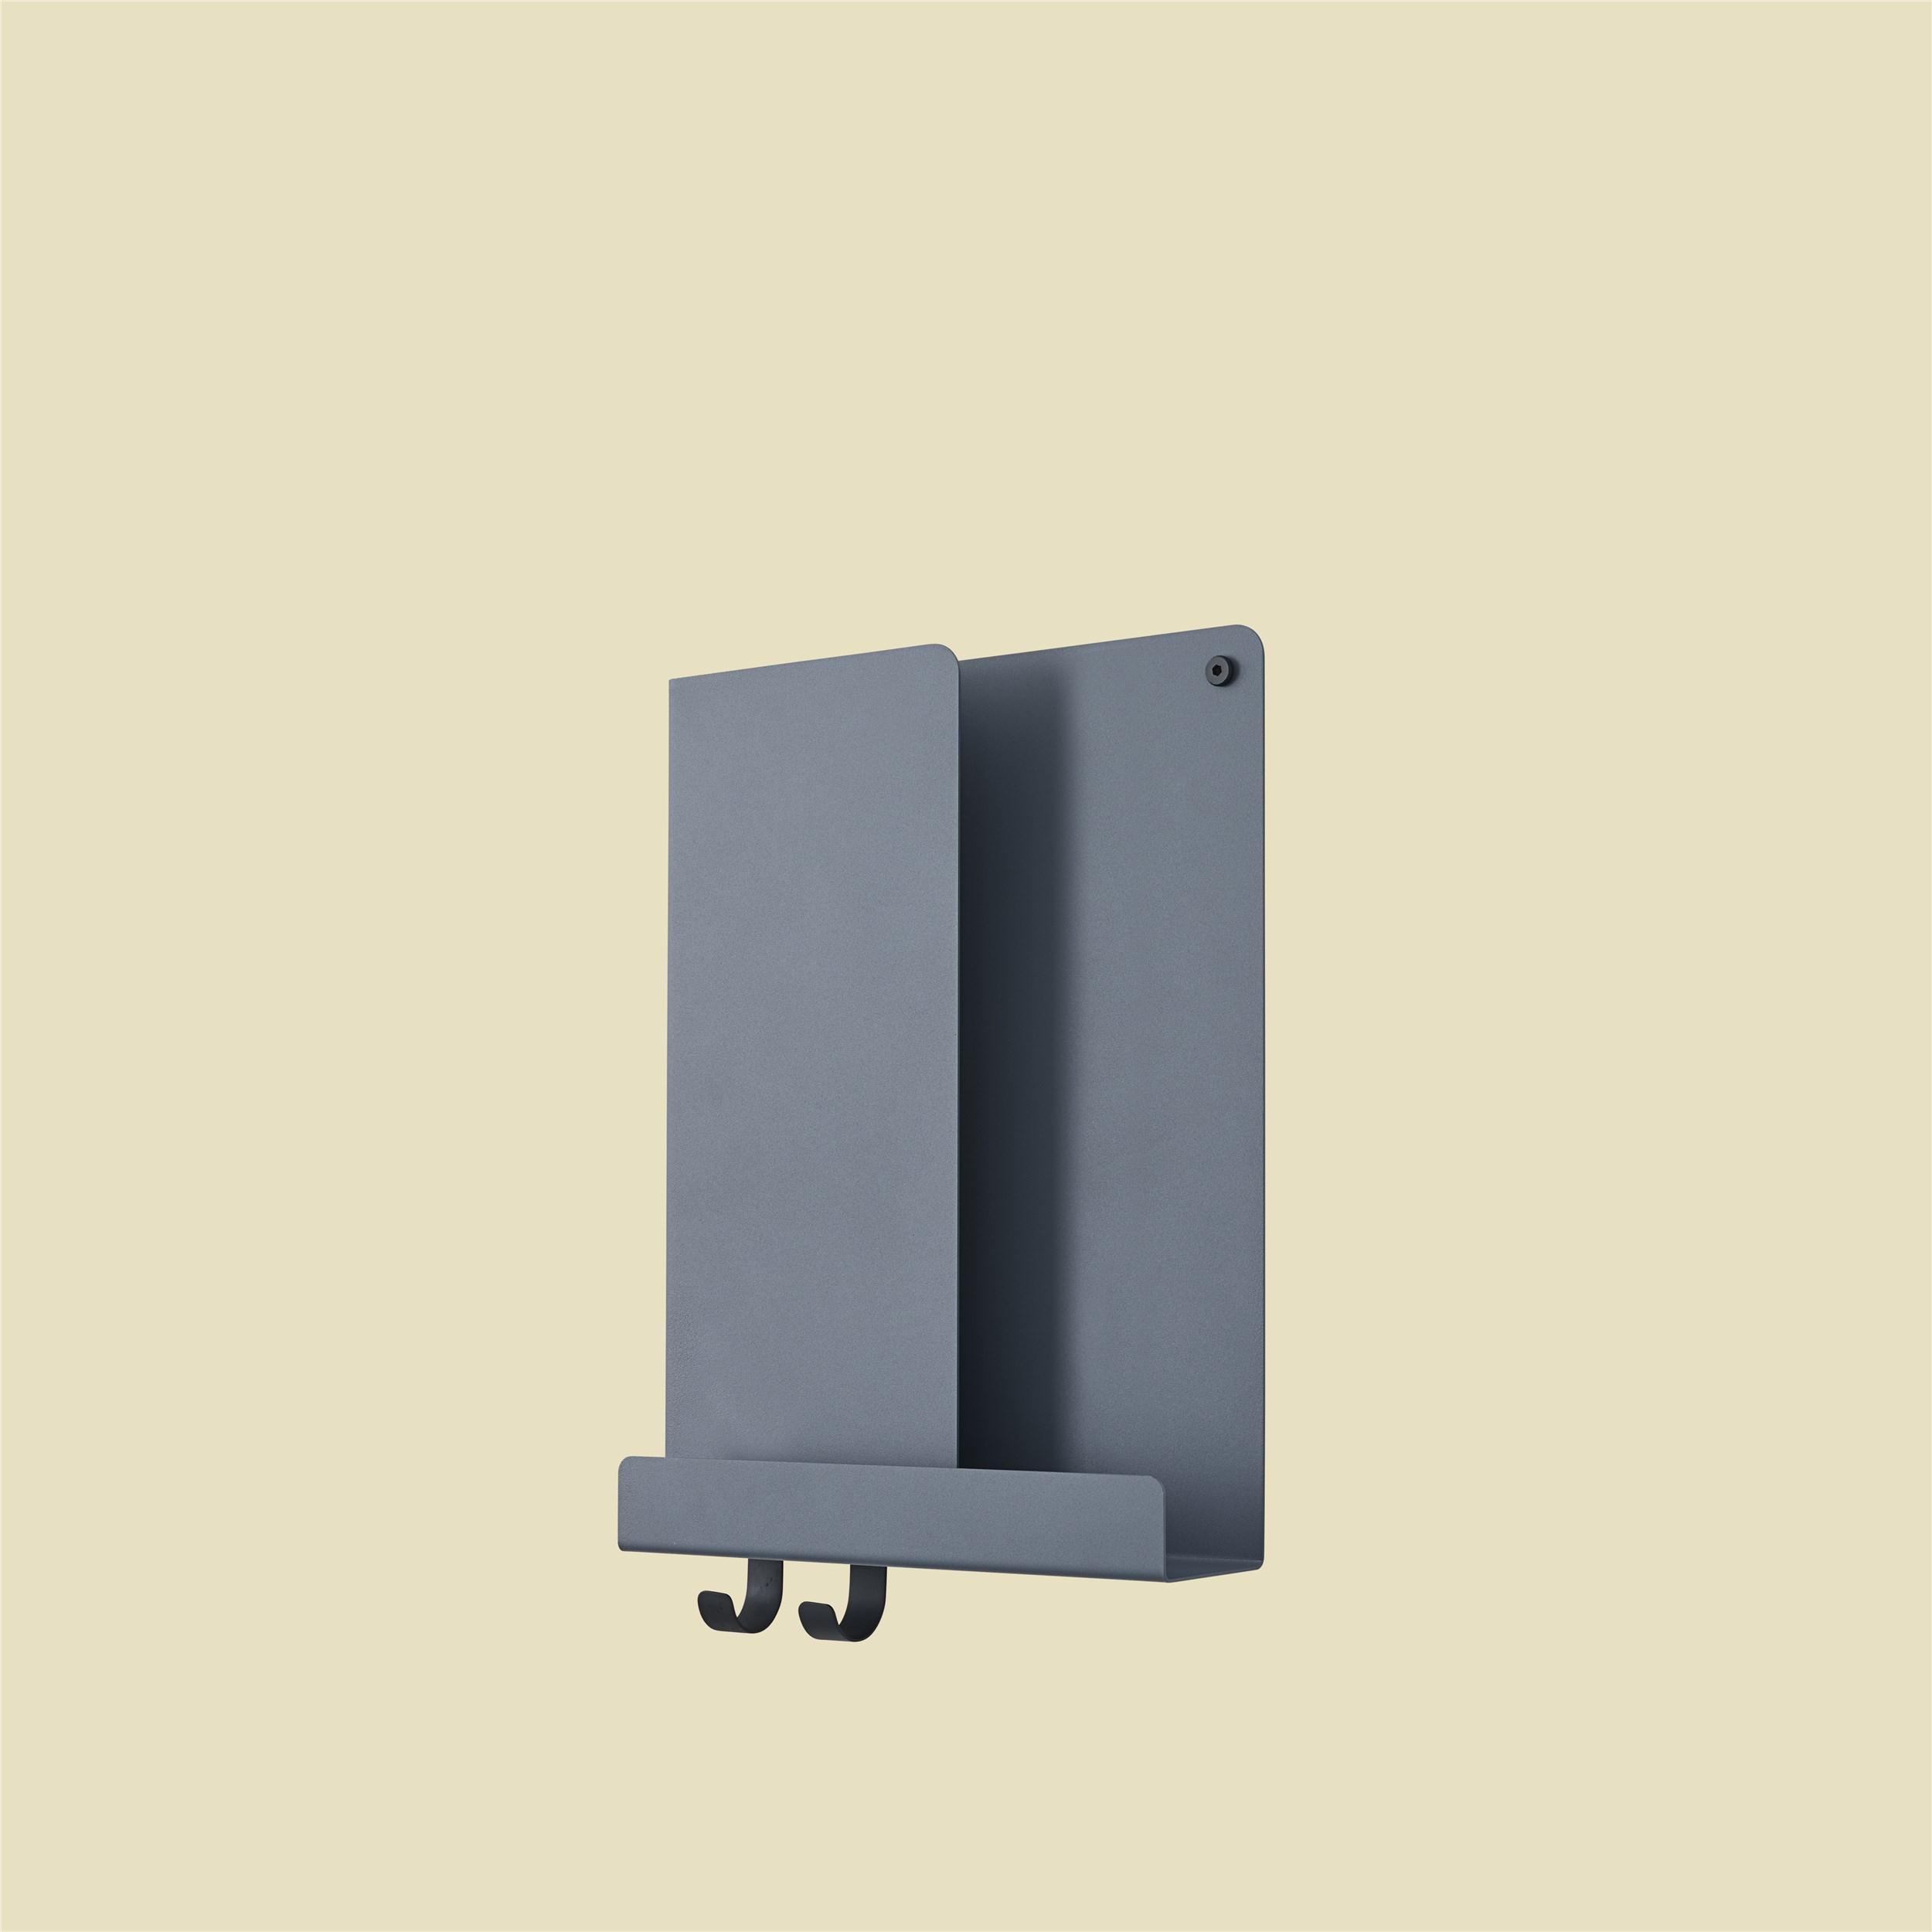 Muuto Folded Shelf Blue Grey 29,5cm